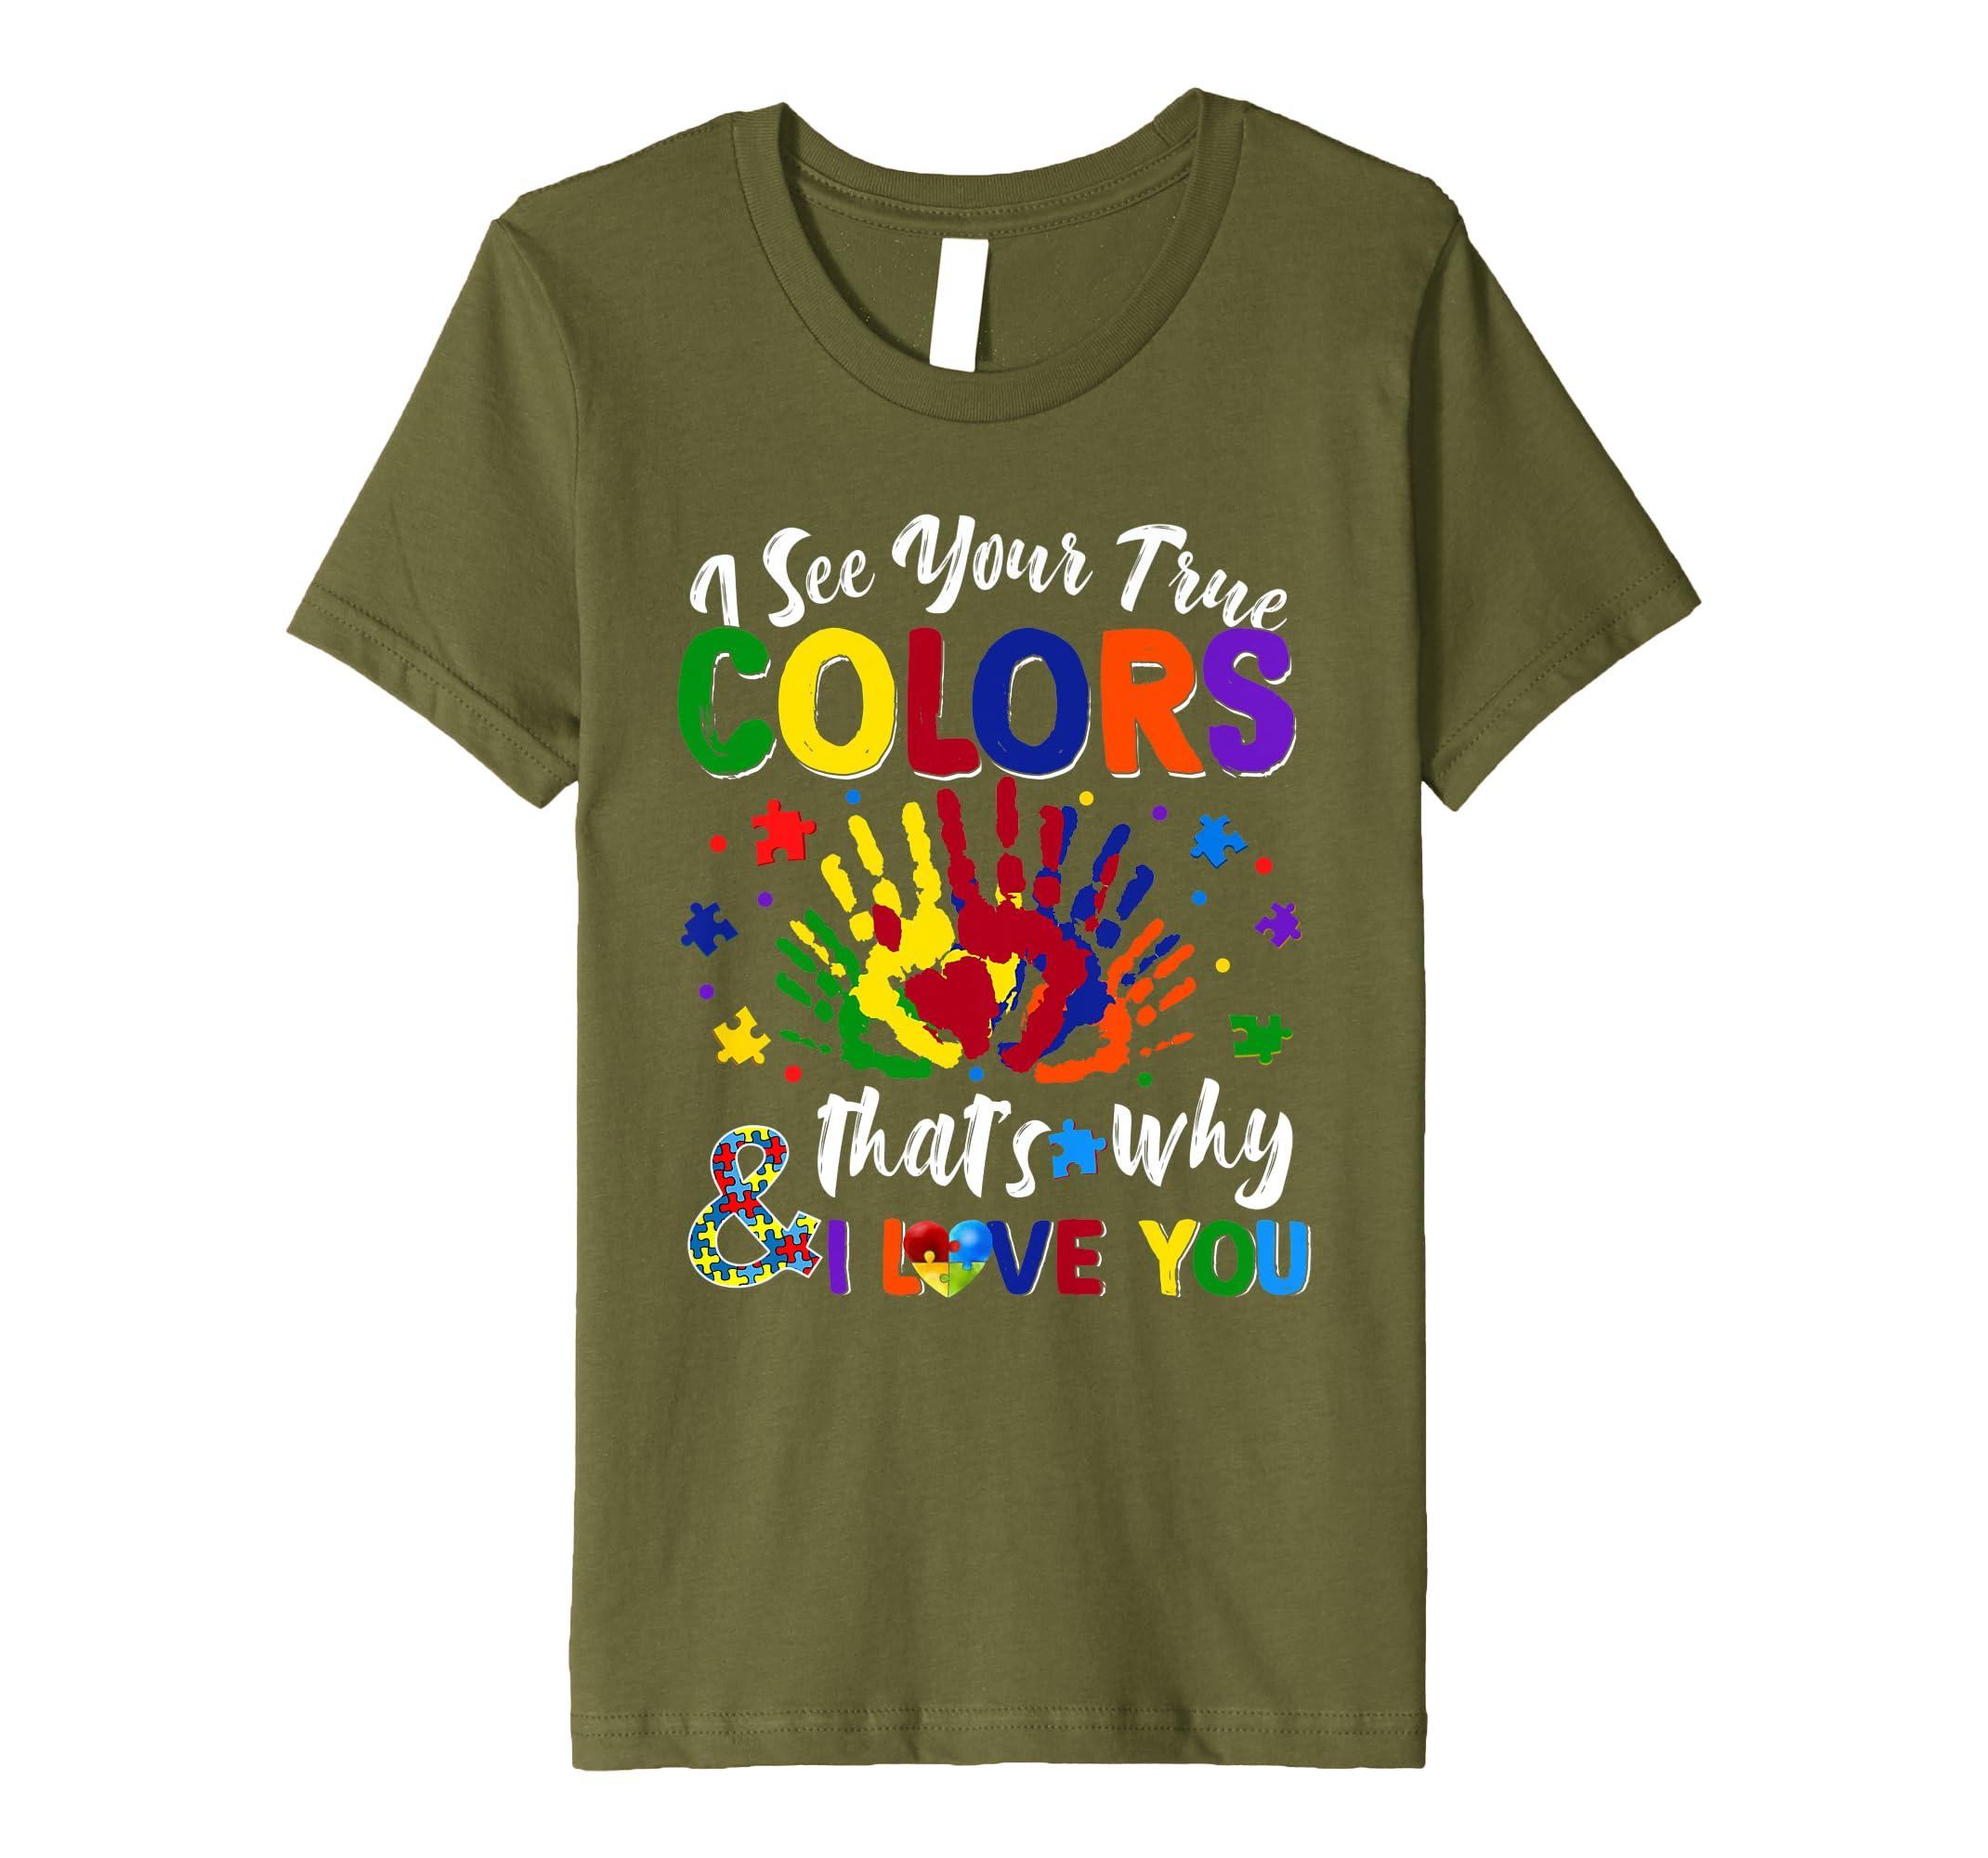 382dc351927 Amazon.com: I See Your True Colors Hands Autism Awareness Tshirt ...